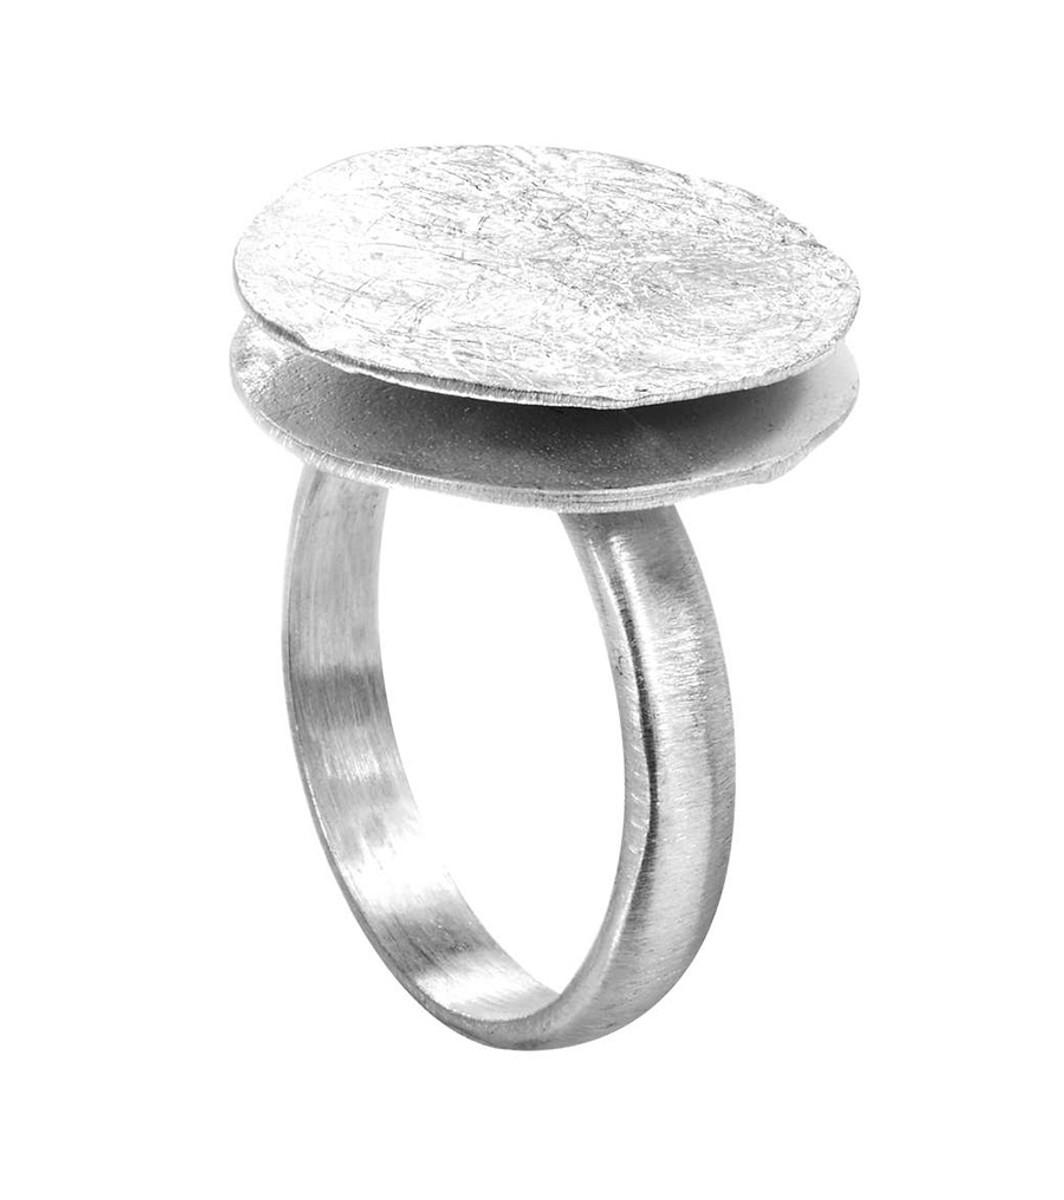 Joidart Freda Small Silver Ring Size 7